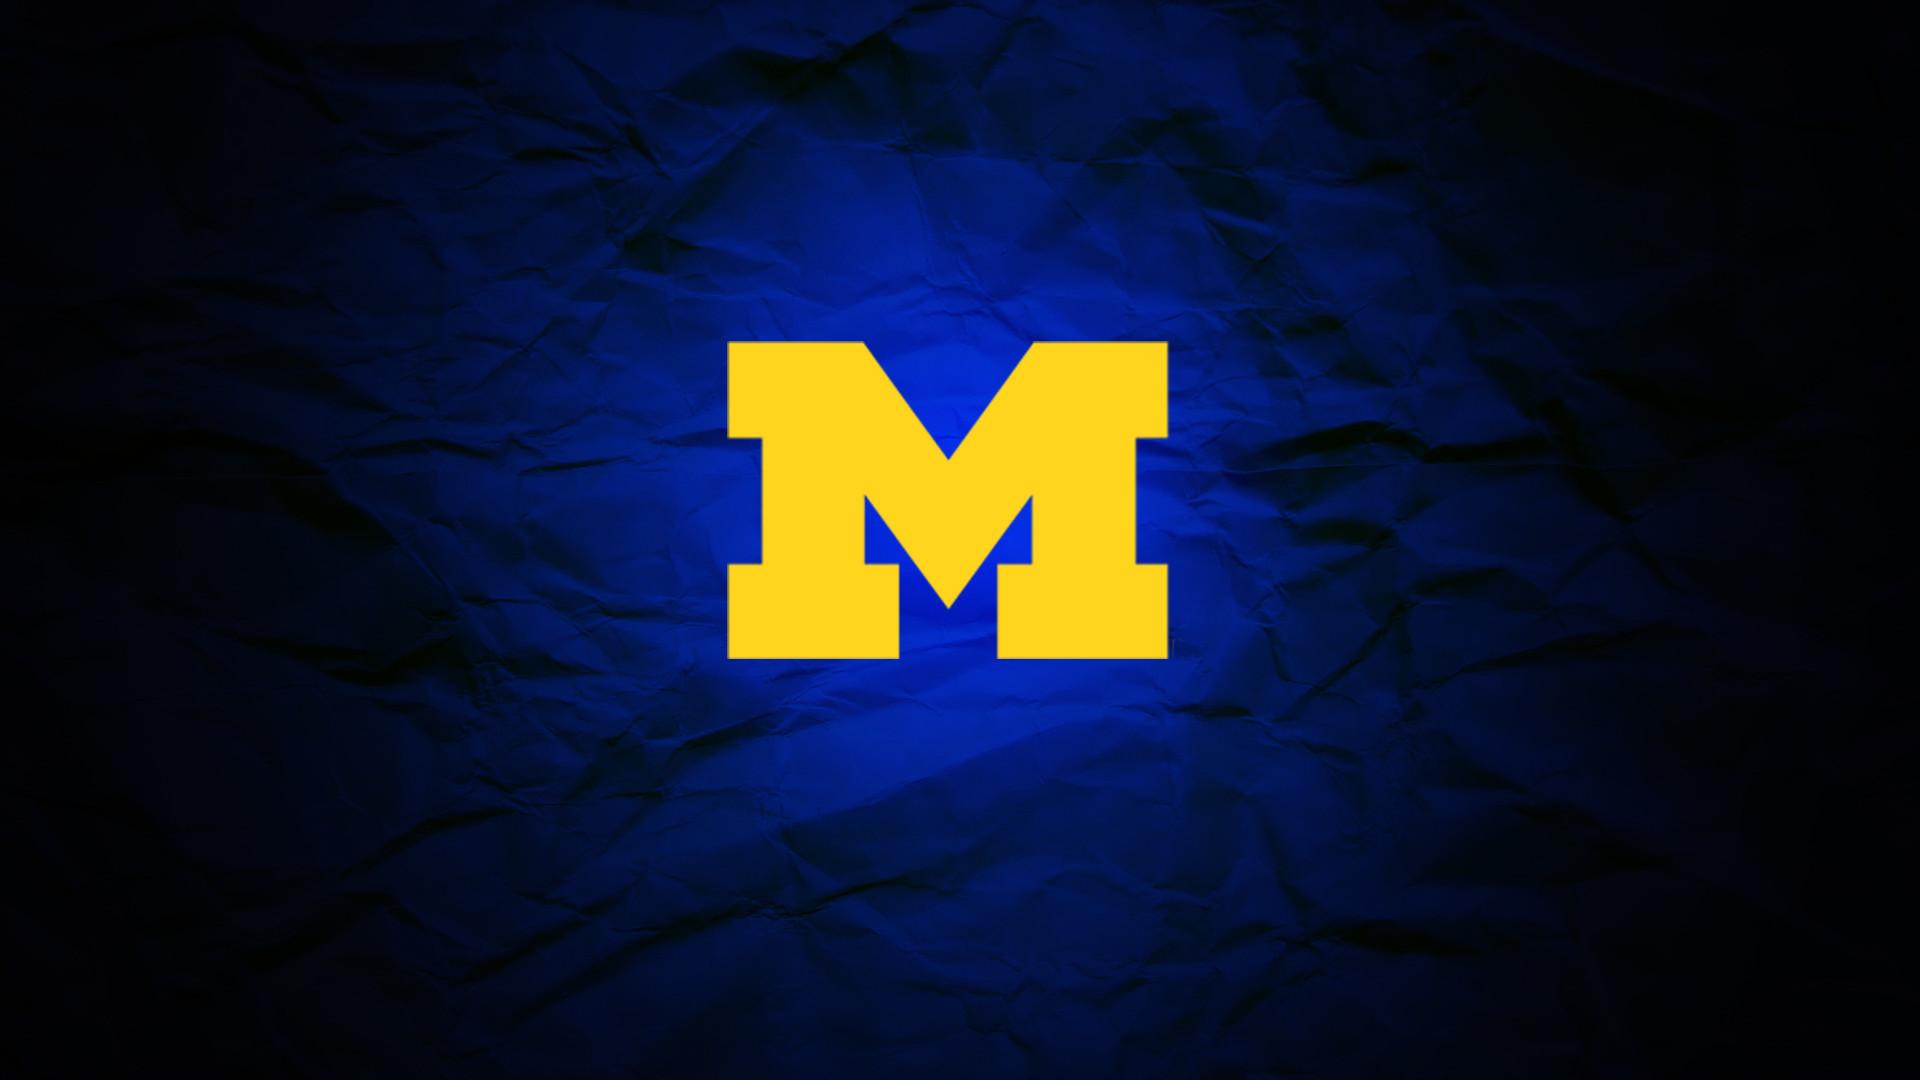 Michigan University Wallpaper Michigan, University, Of ..